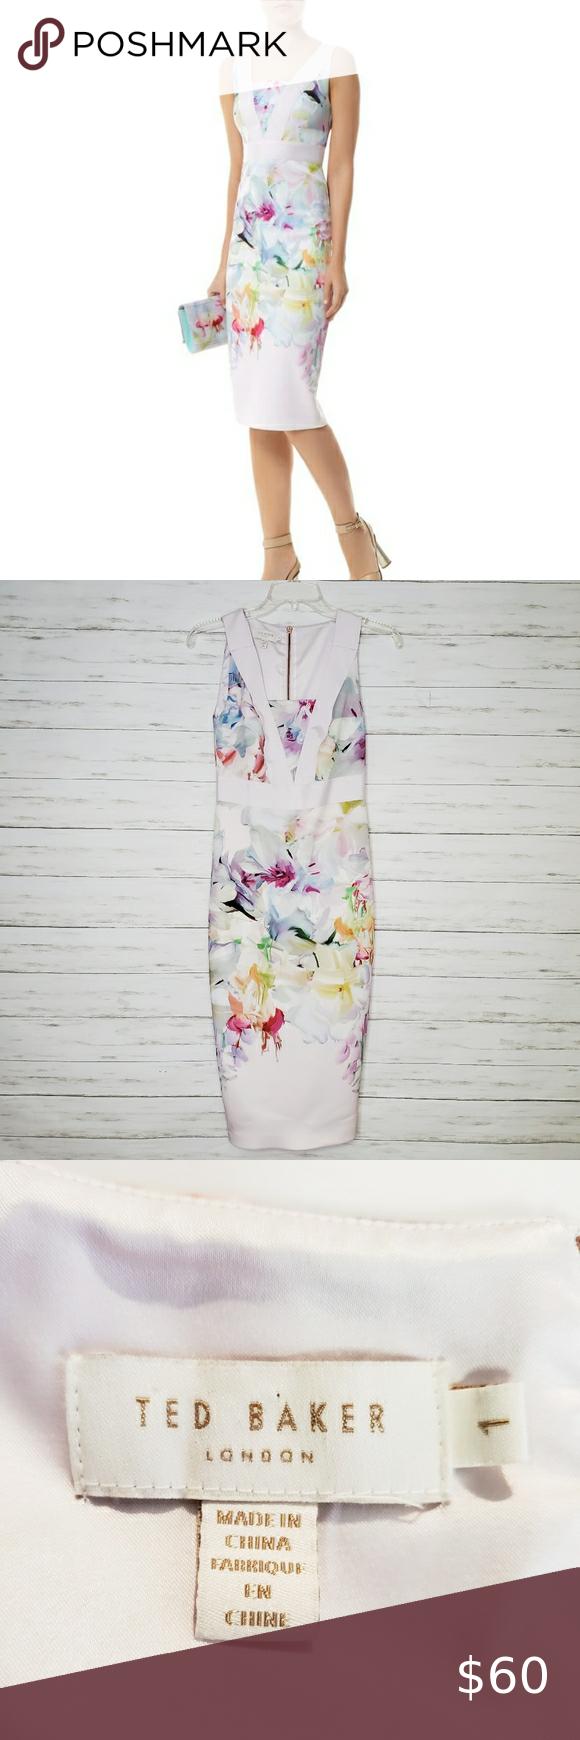 980878b52a9315c972dfe5c7938a02cb - Ted Baker Arienne Hanging Gardens Dress